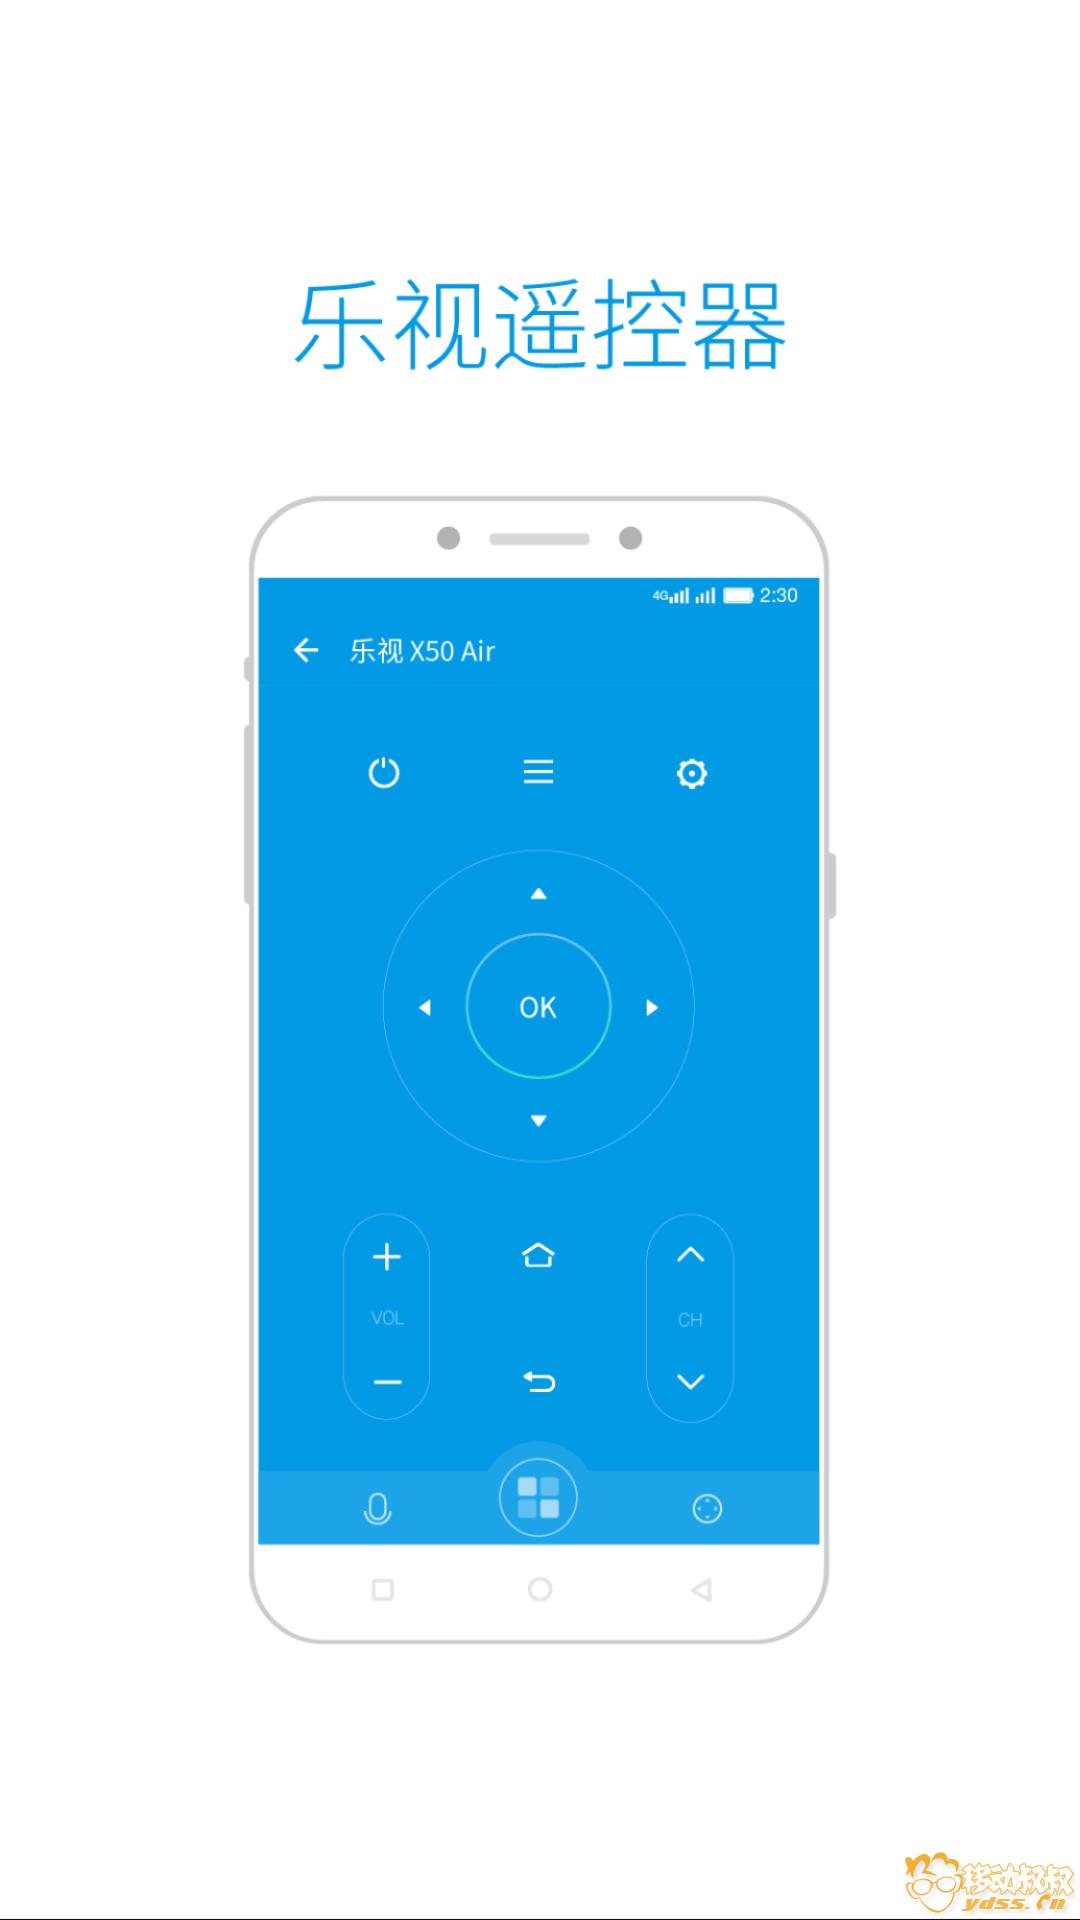 Screenshot_2017-11-29-13-16-49-287_com.letv.android.remotecontrol.png